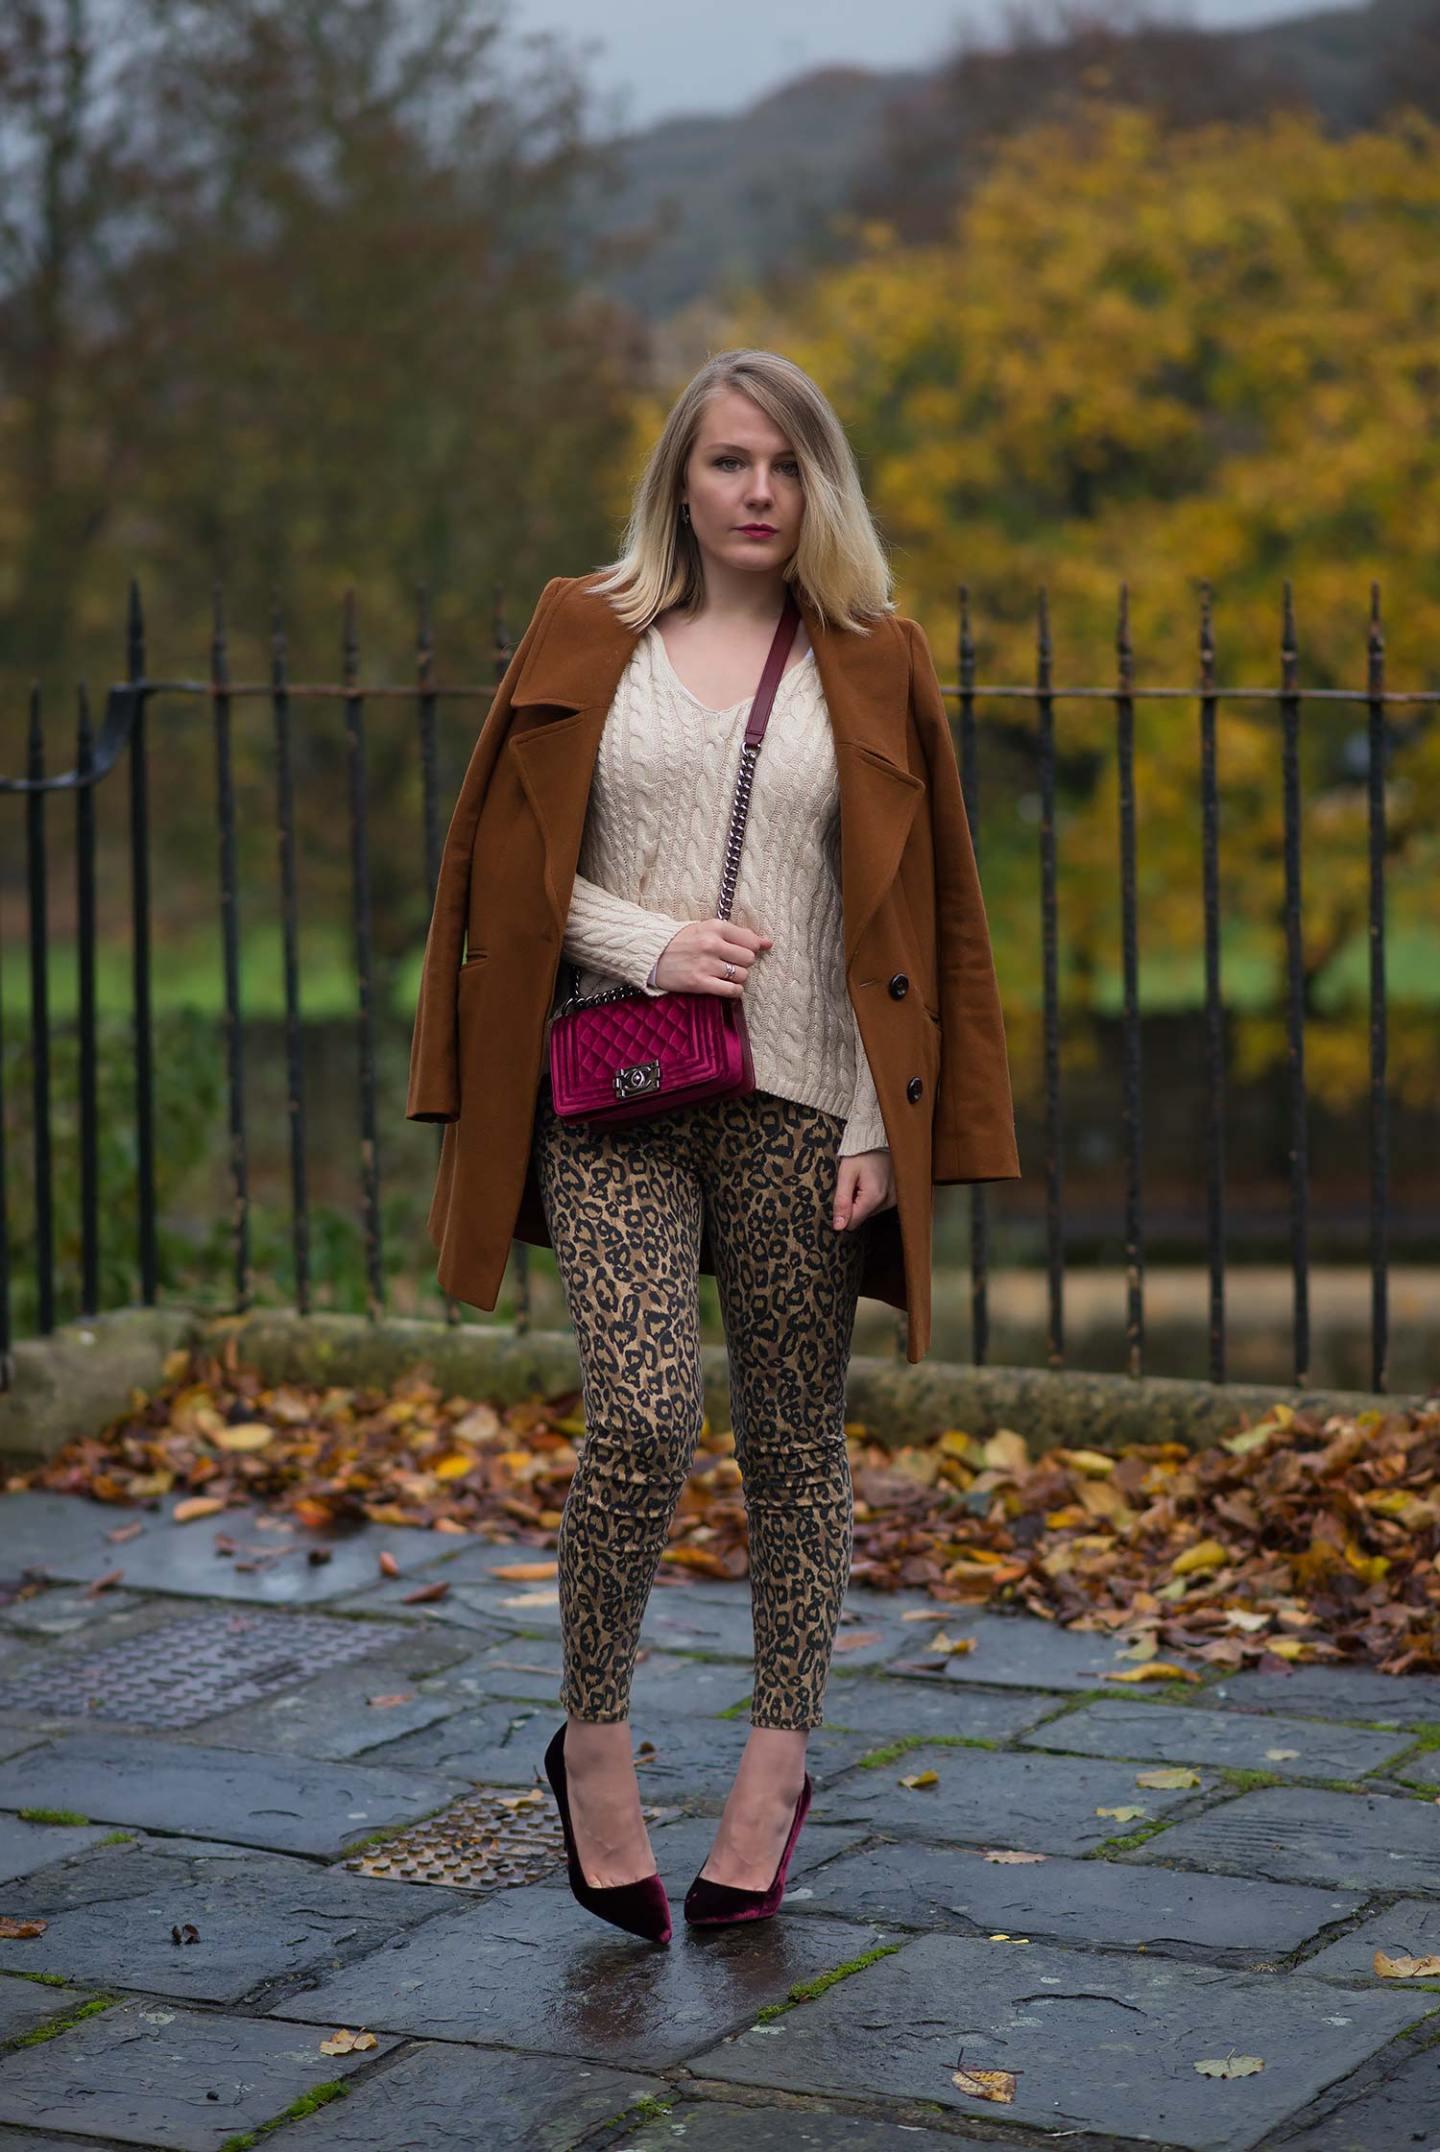 lorna-burford-fashion-blogger-leopard-j-brand-jeans